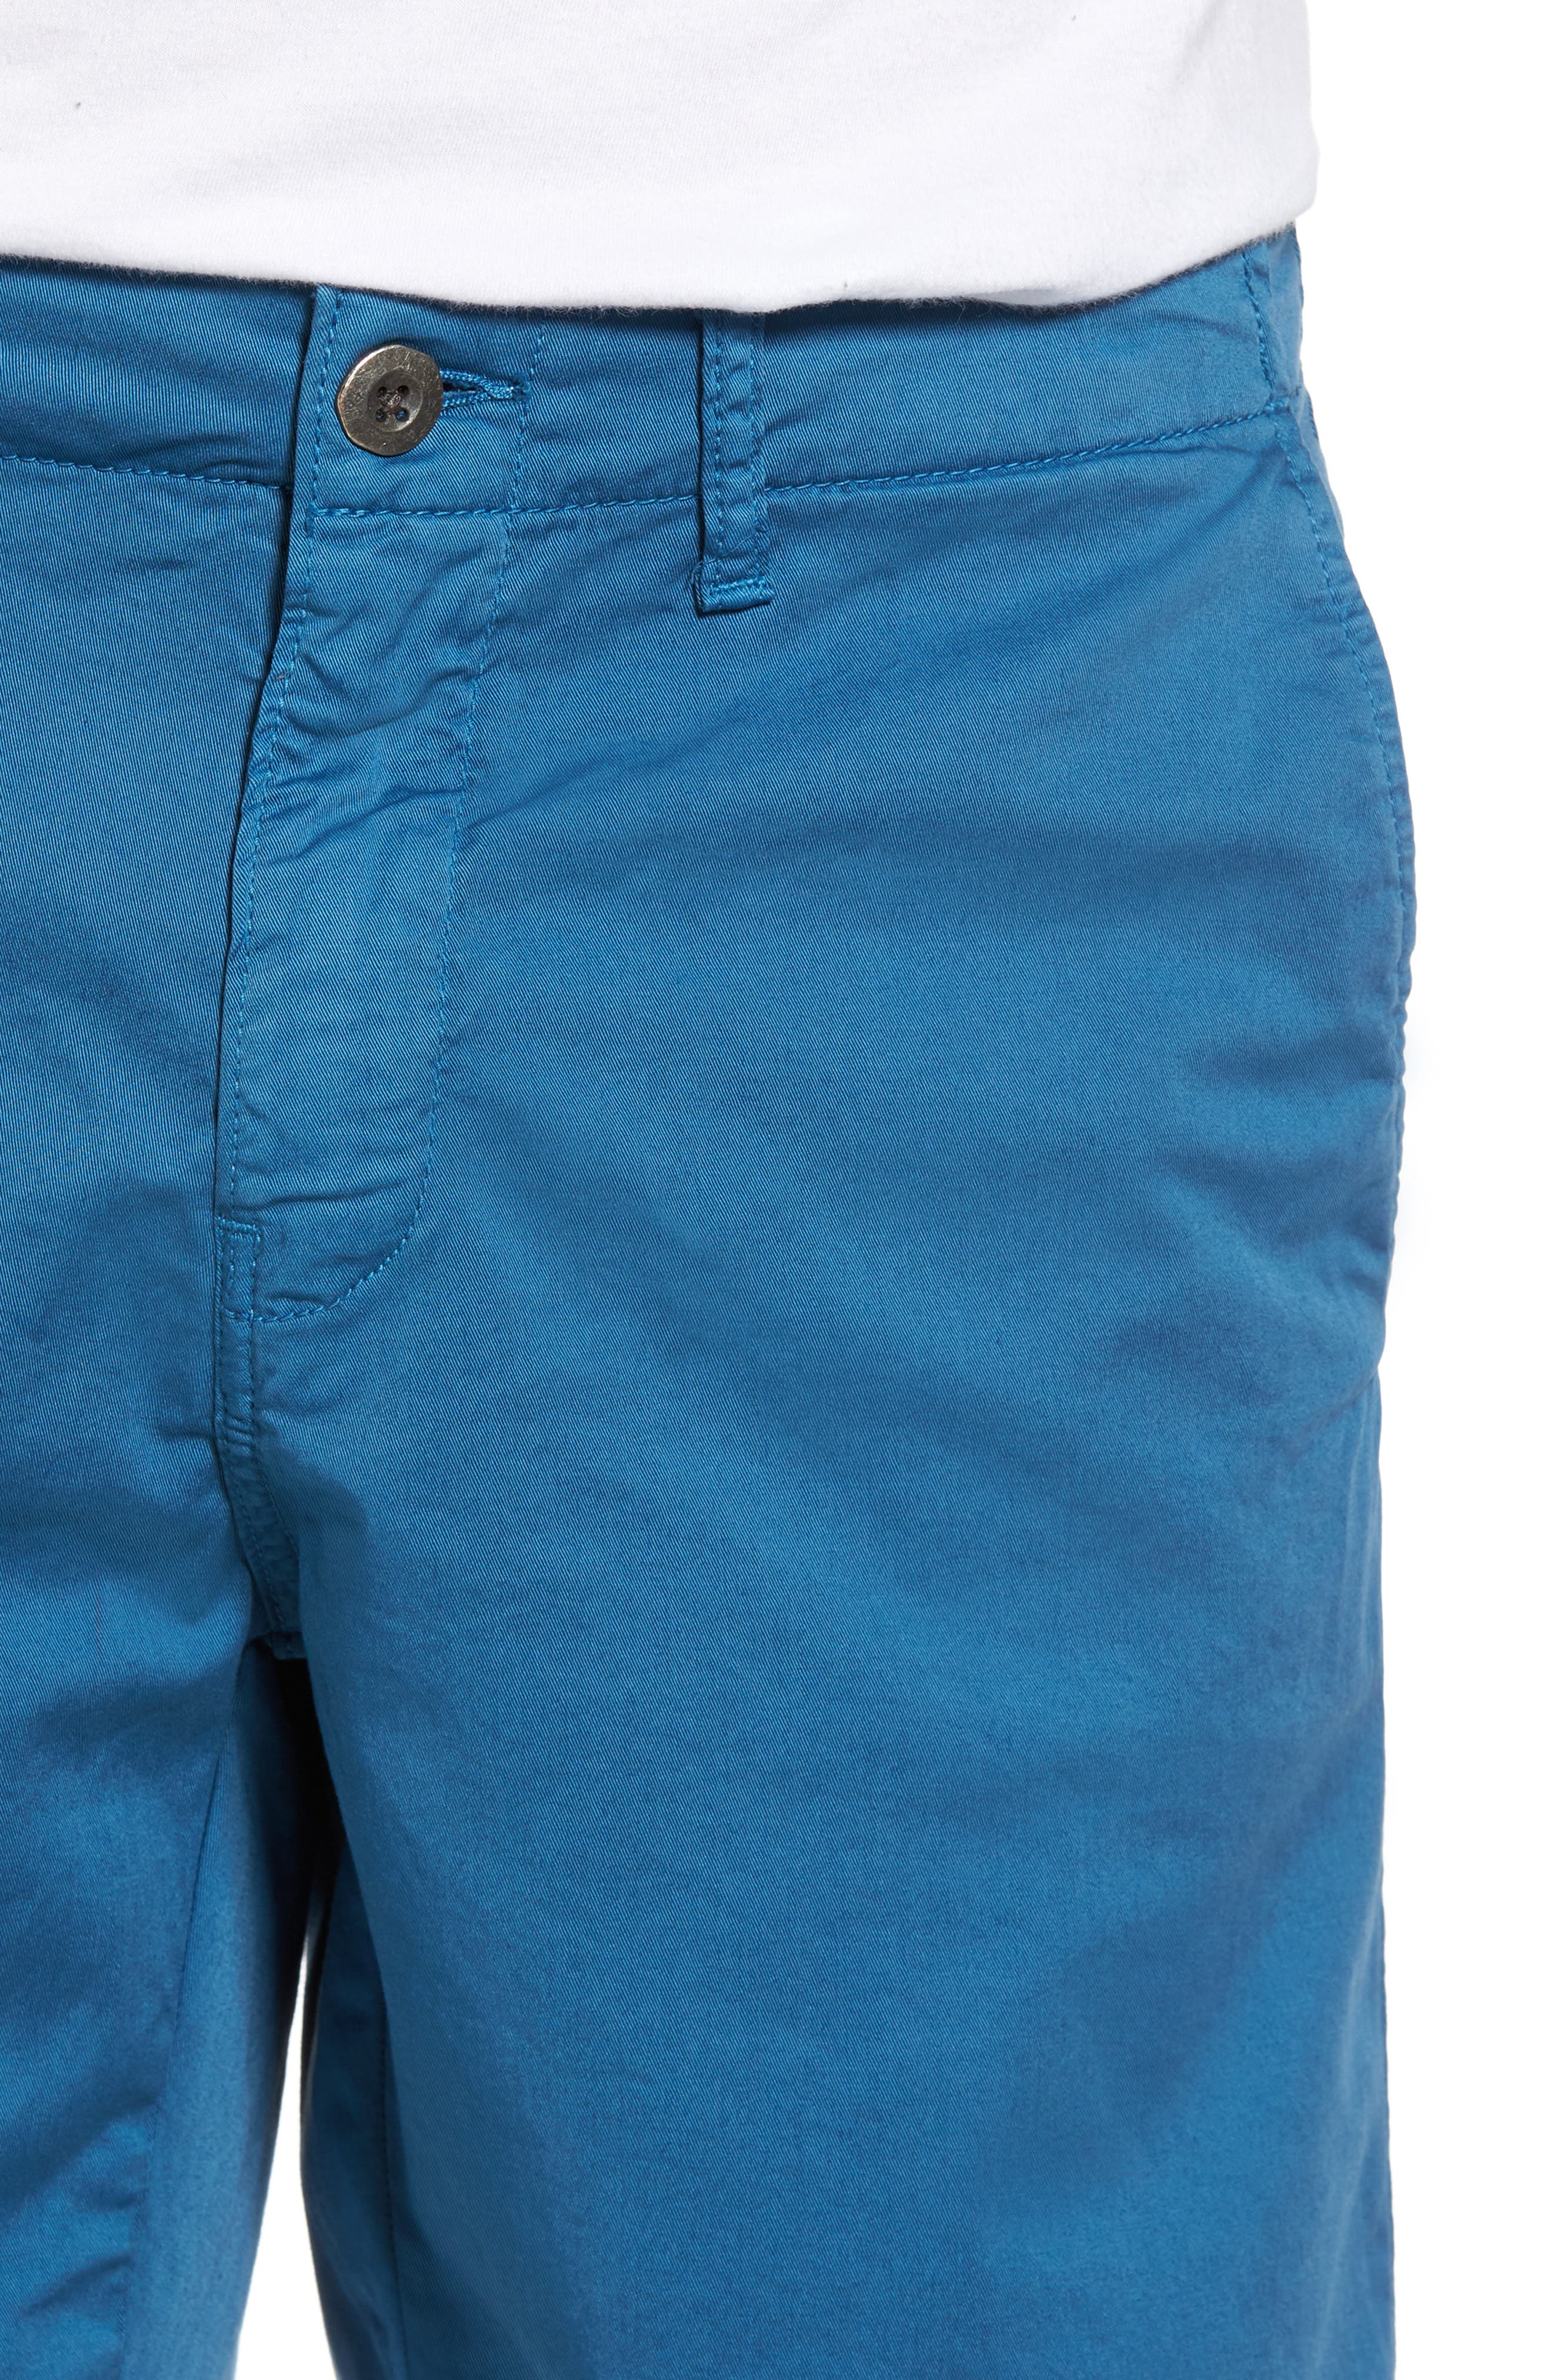 St. Barts Twill Shorts,                             Alternate thumbnail 46, color,